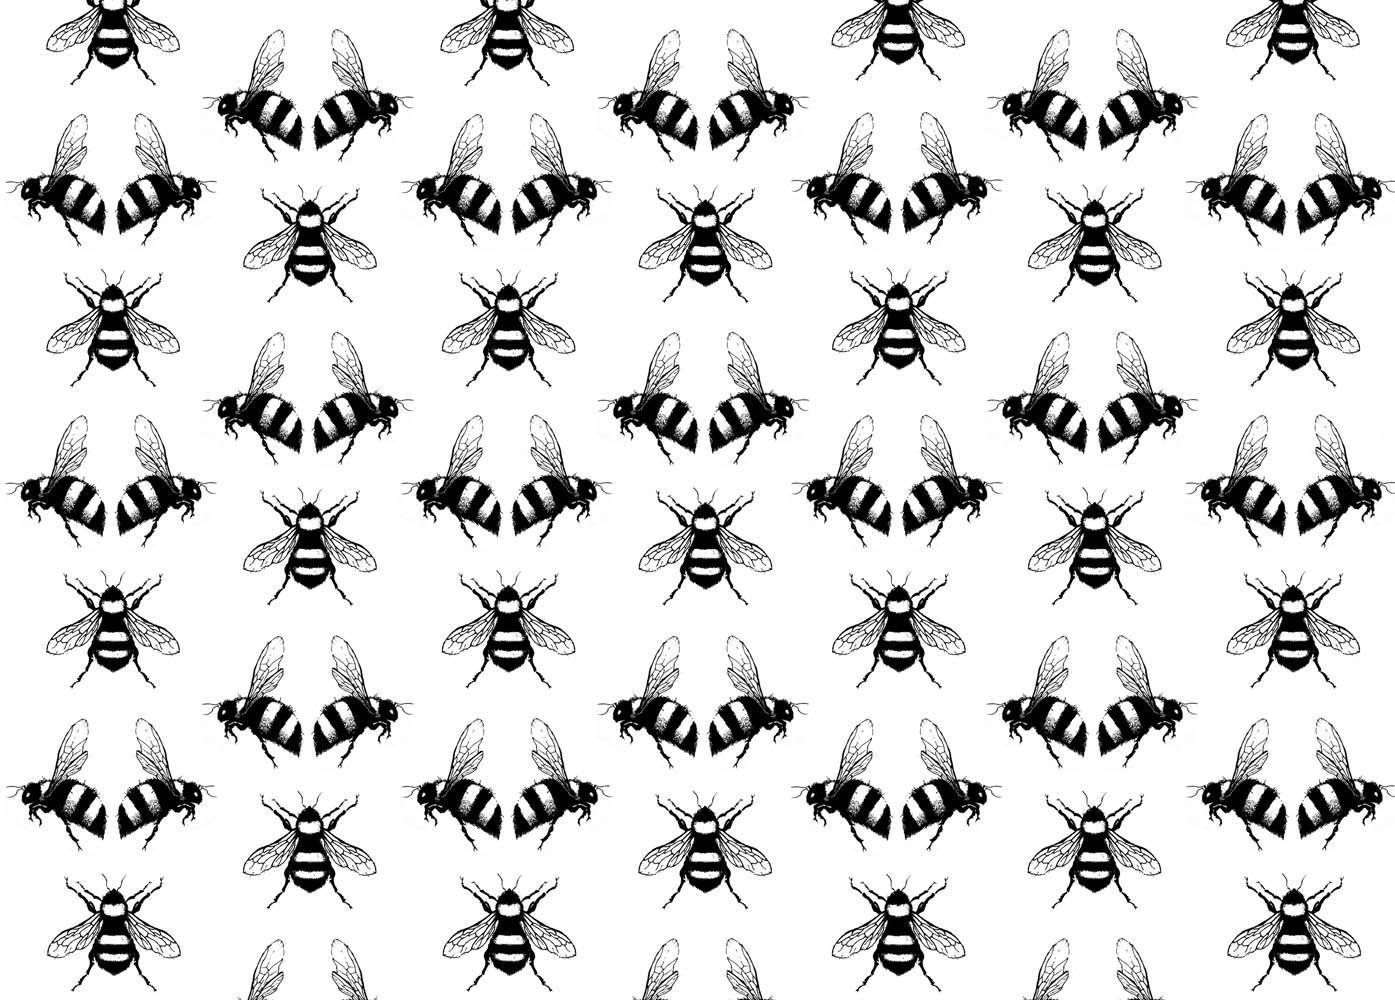 wallpaper pattern plants - Google zoeken